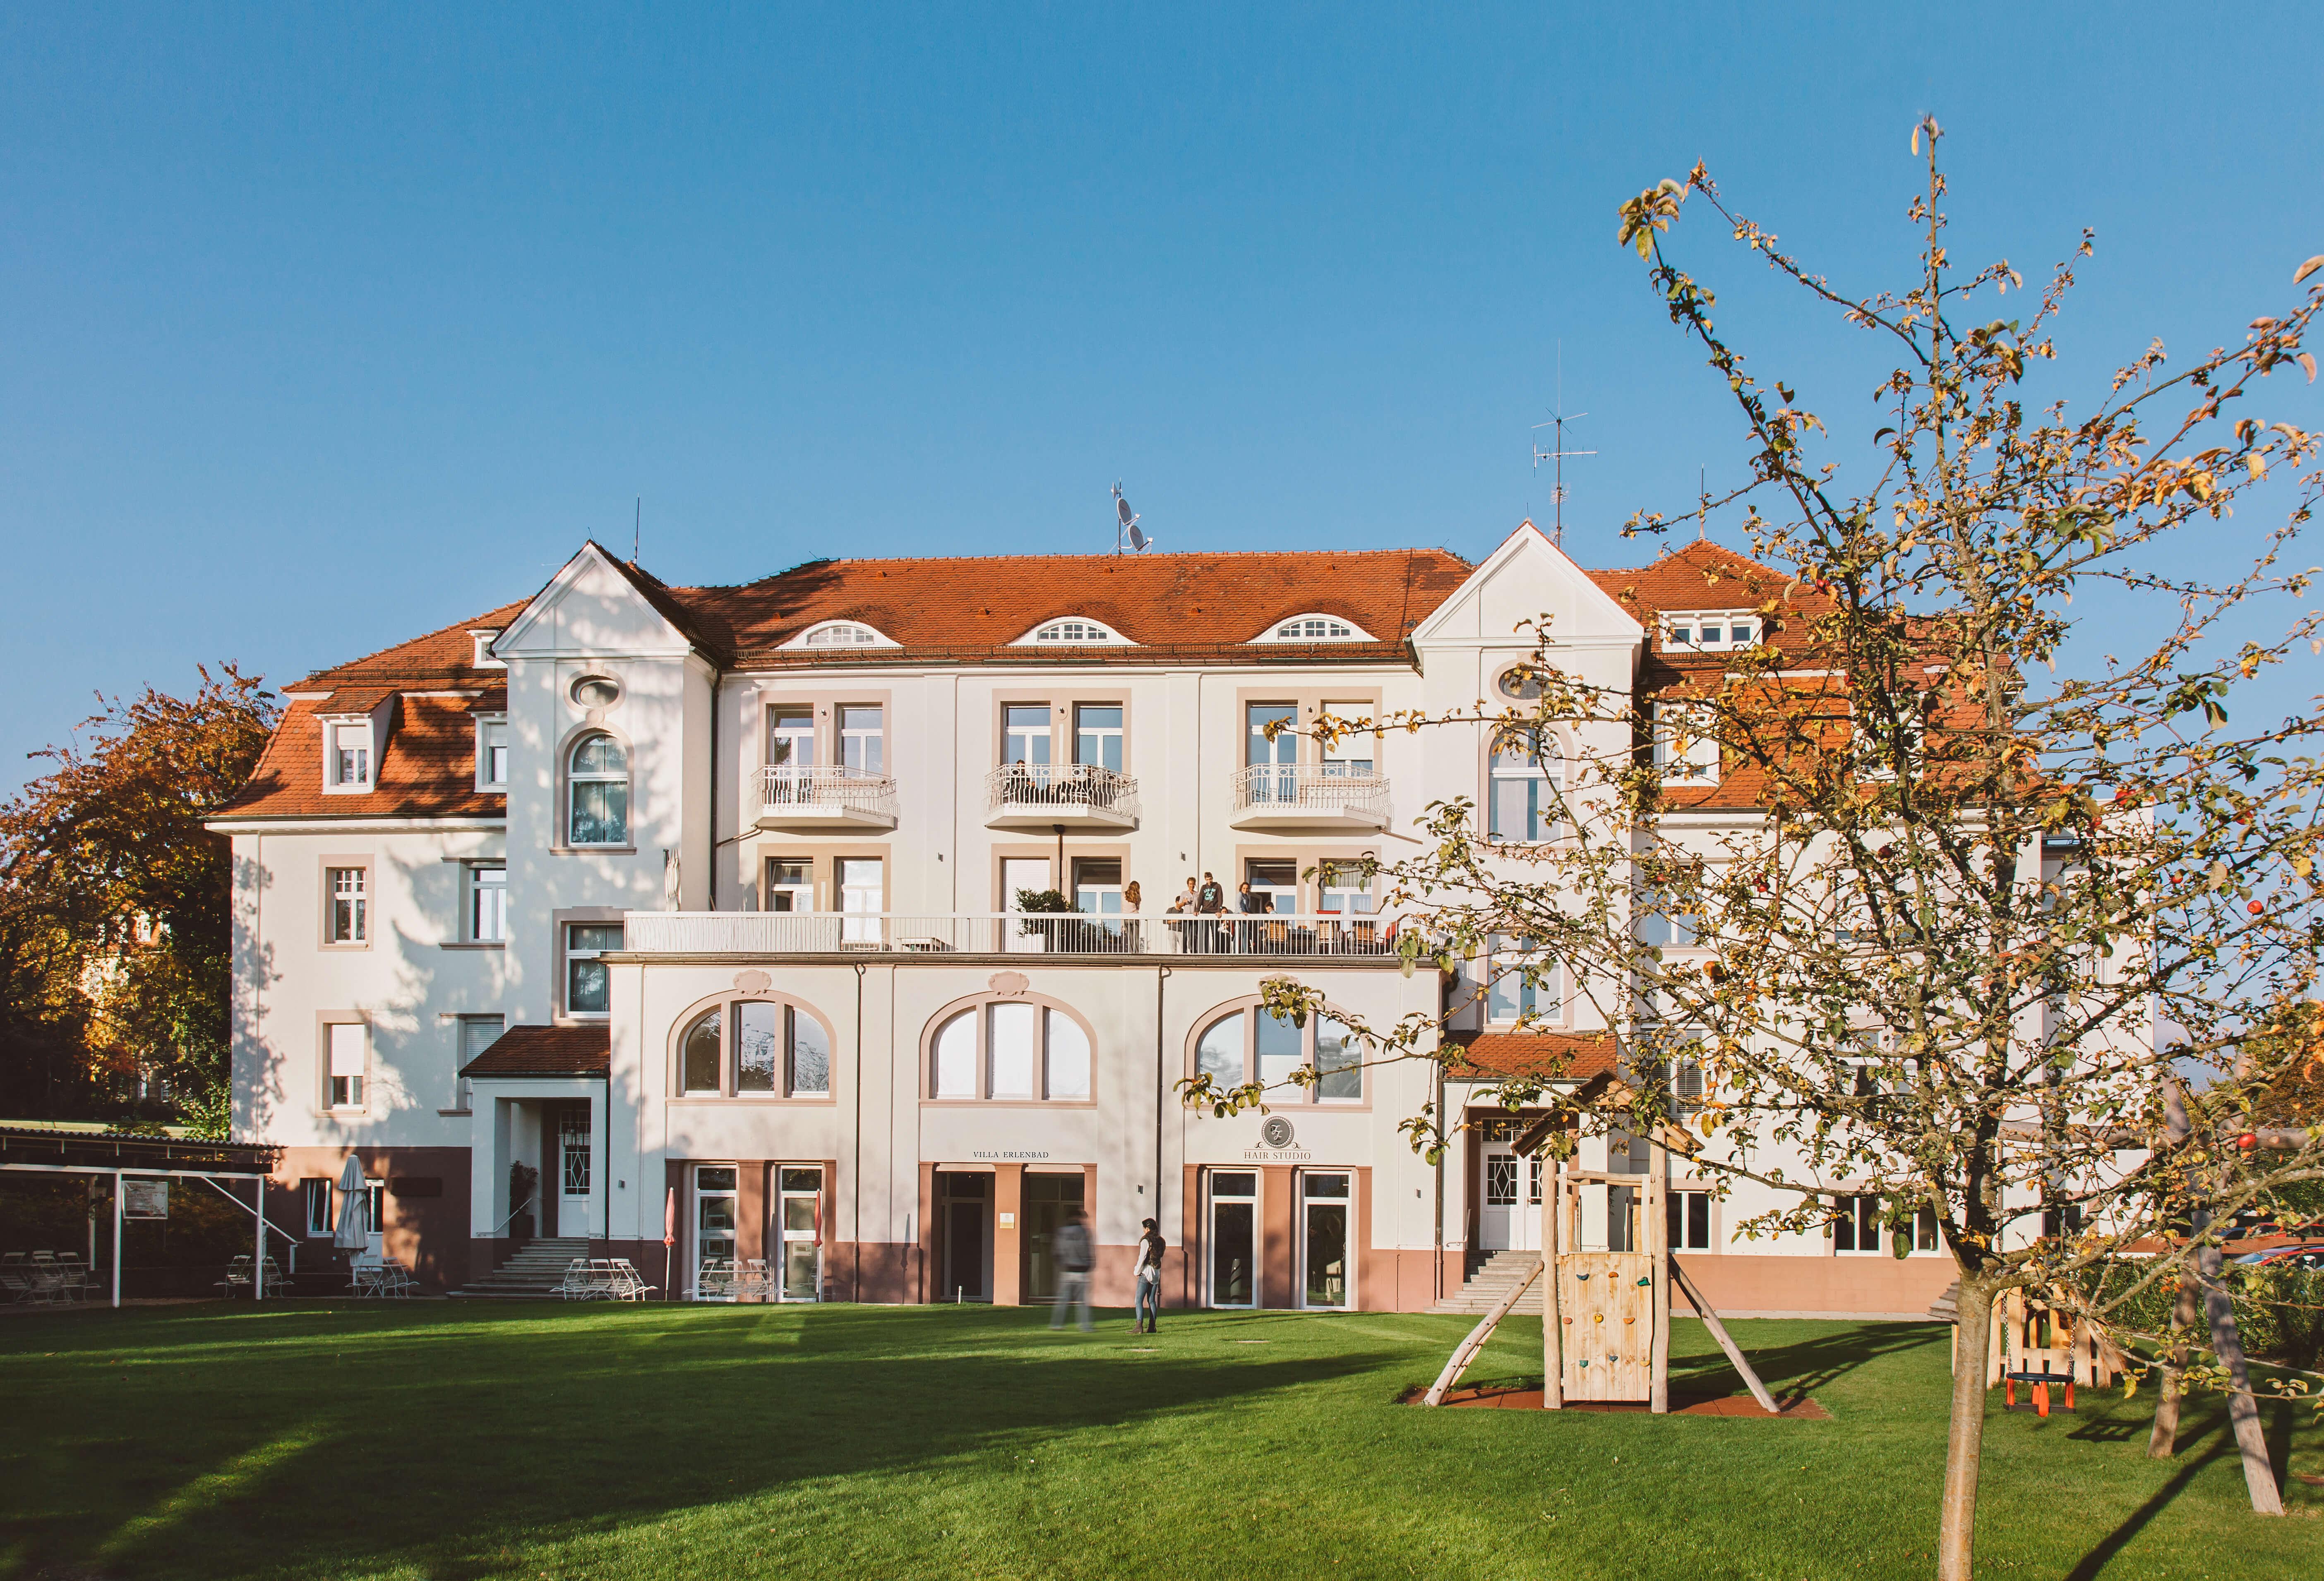 Villa Erlenbad Aussenansicht, Schloss, Wiese, Baum